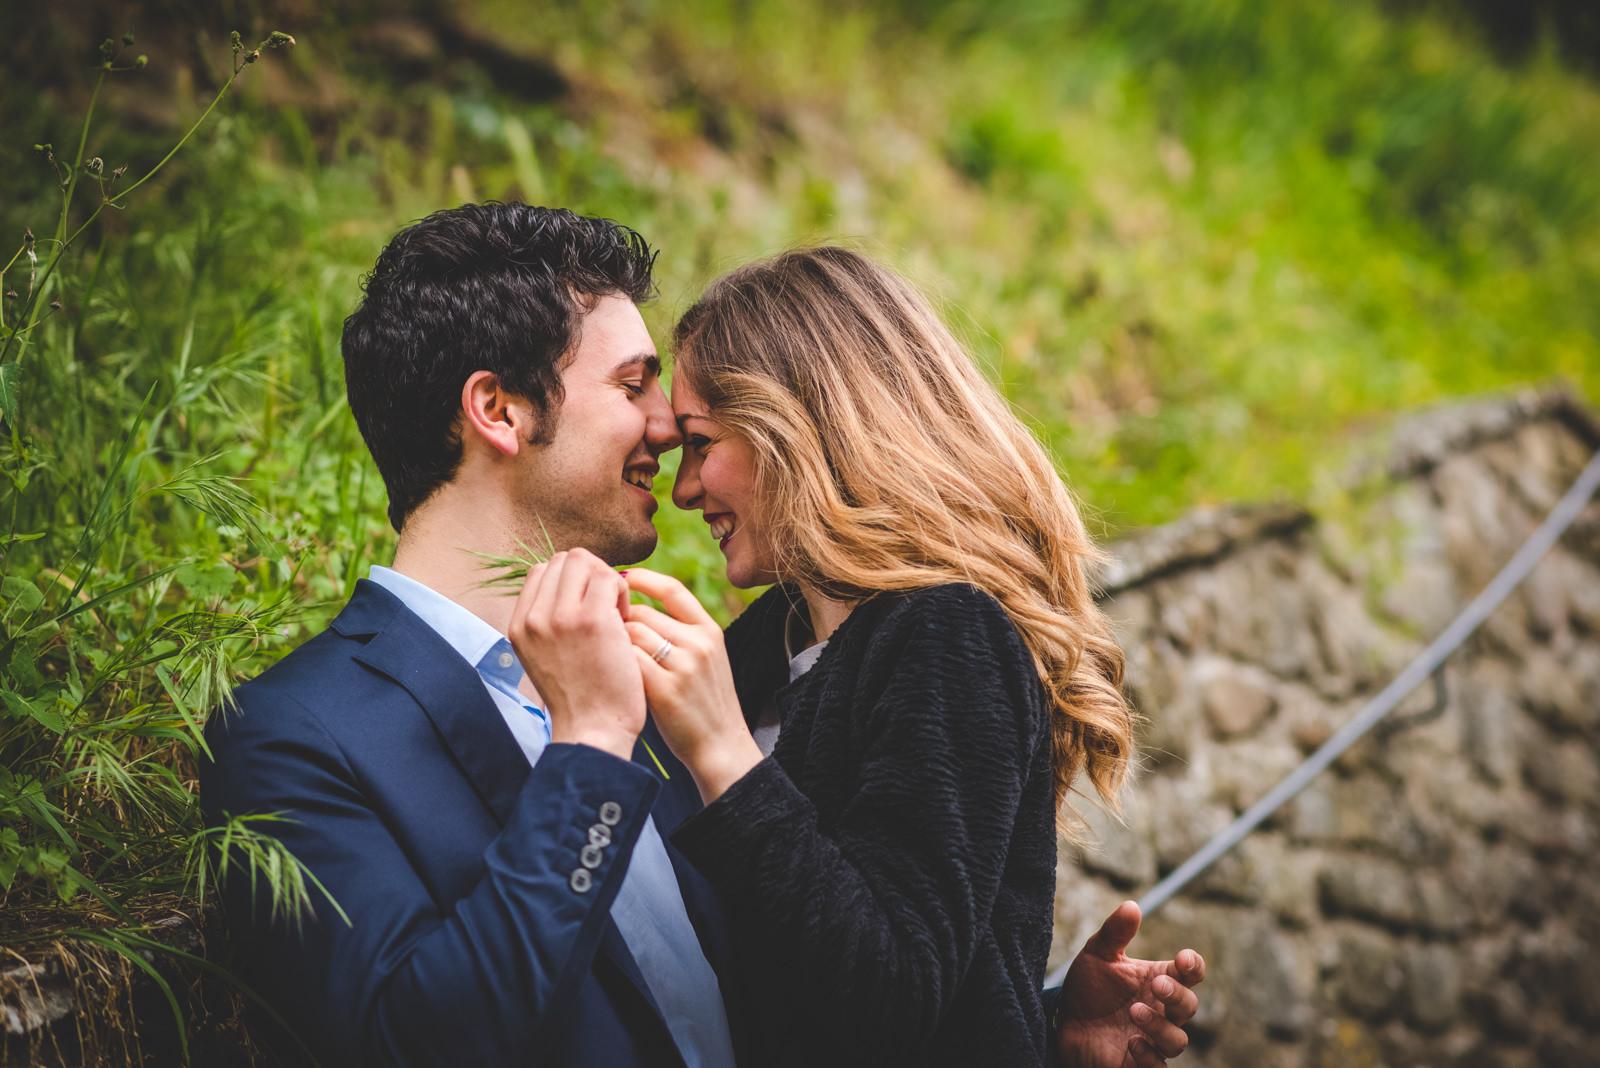 Couple Portraits Photographer Fiesole